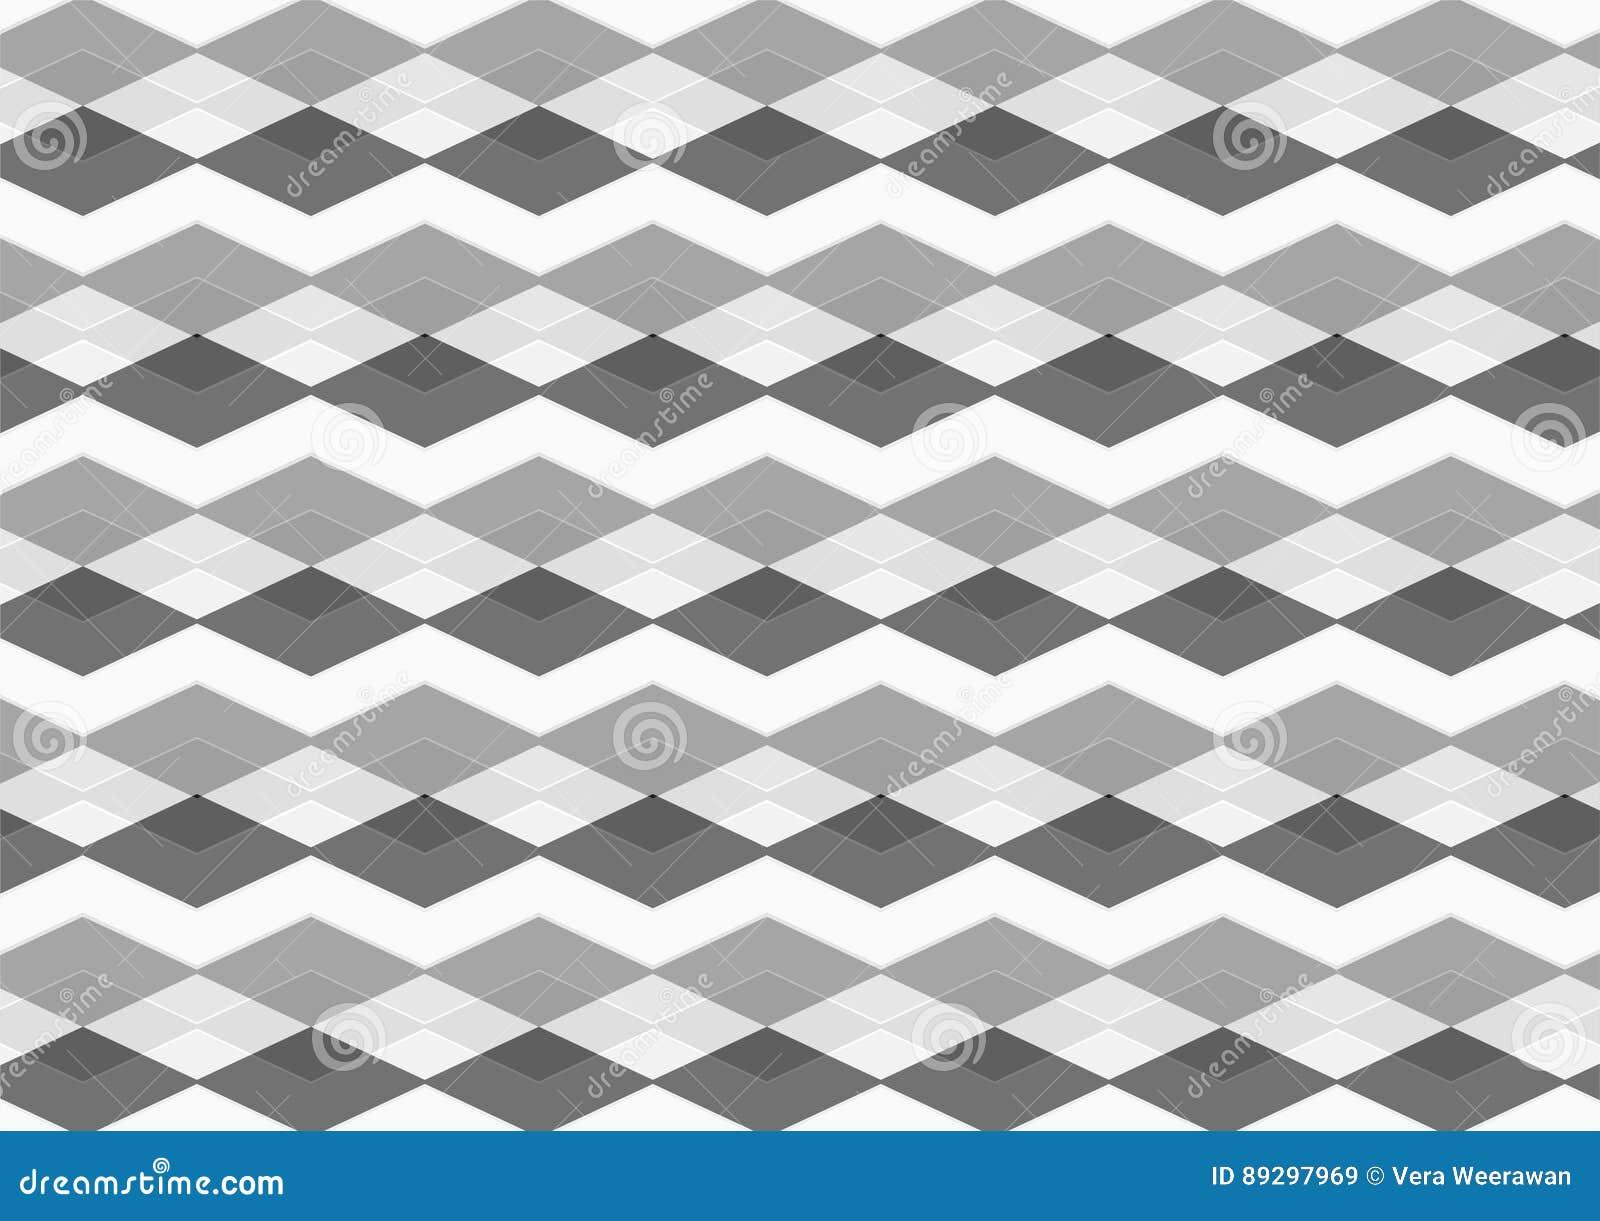 Chevron Diamond Black Gray And White Seamless Patterns